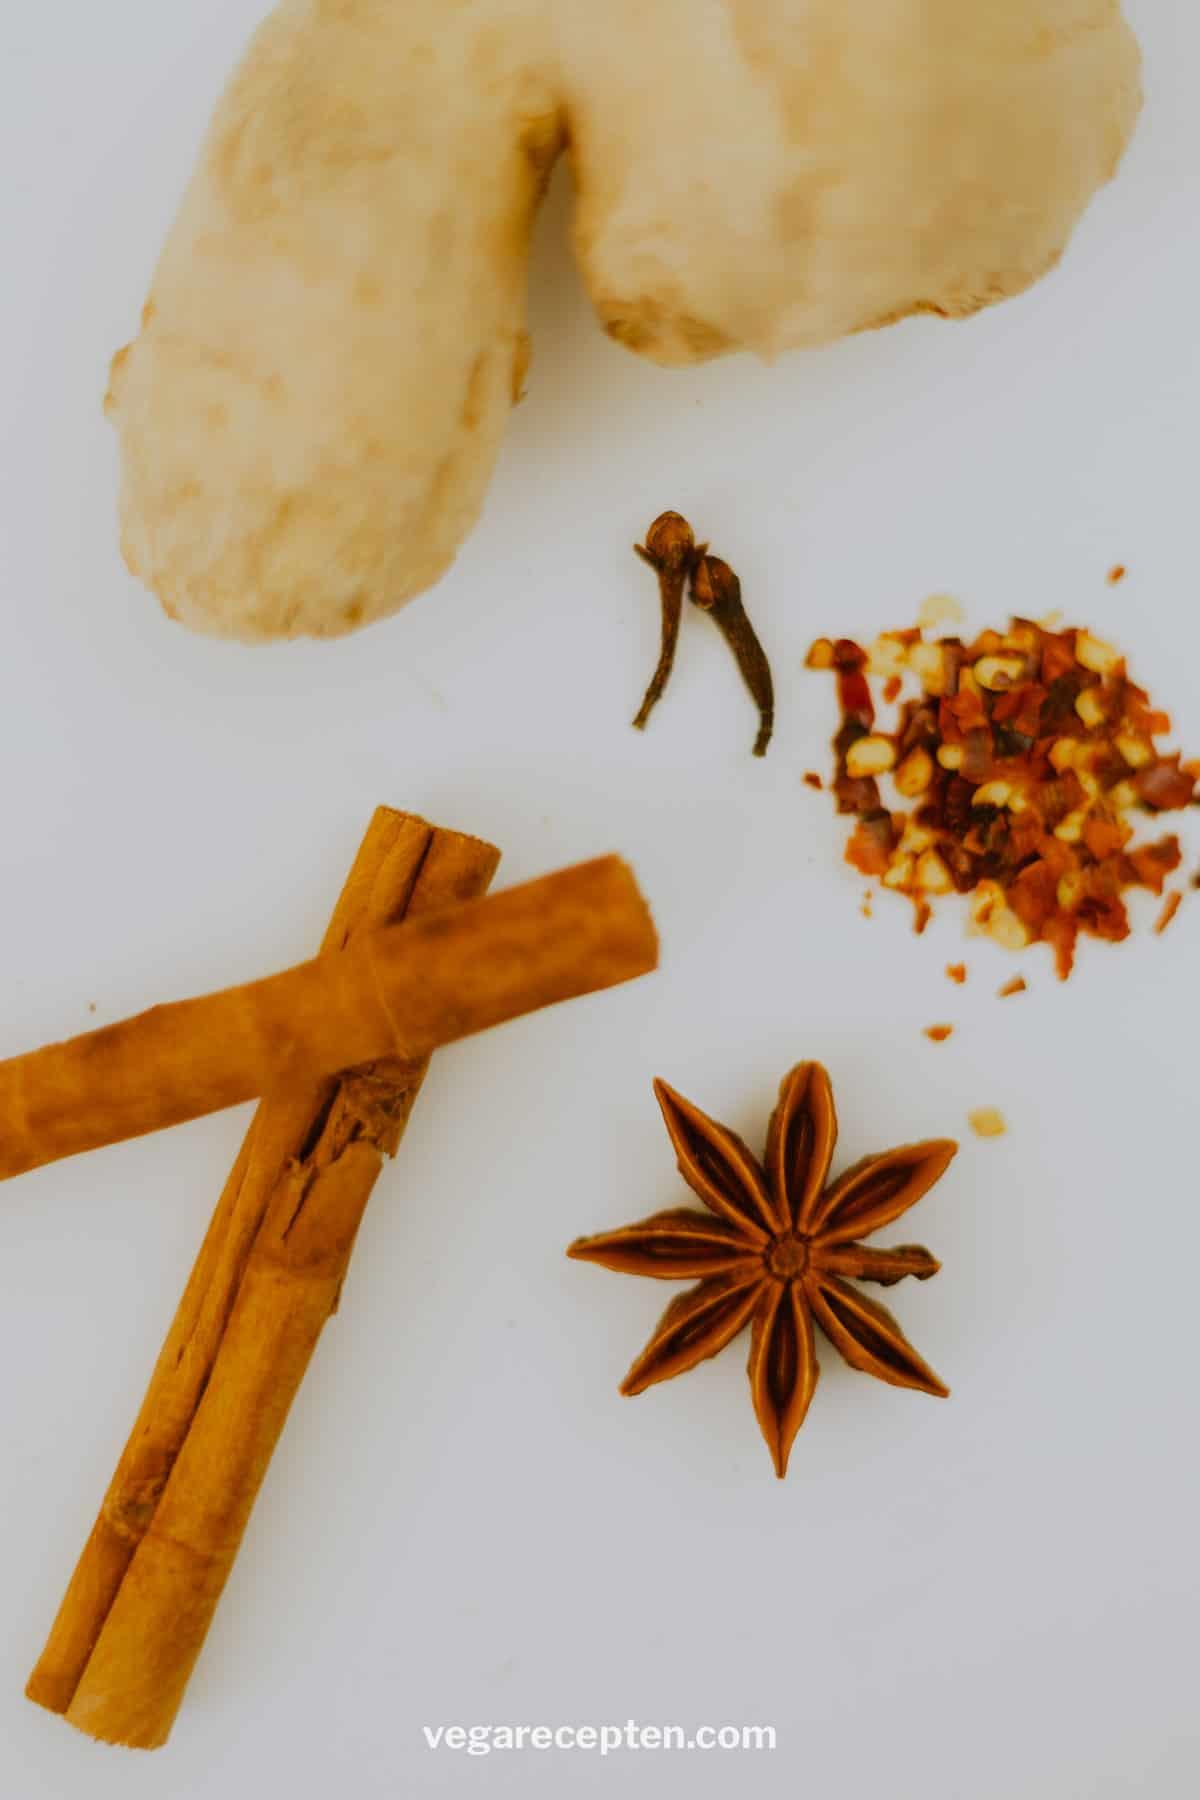 Warme chocolademelk variatie kruiden kaneel anijs chili gember